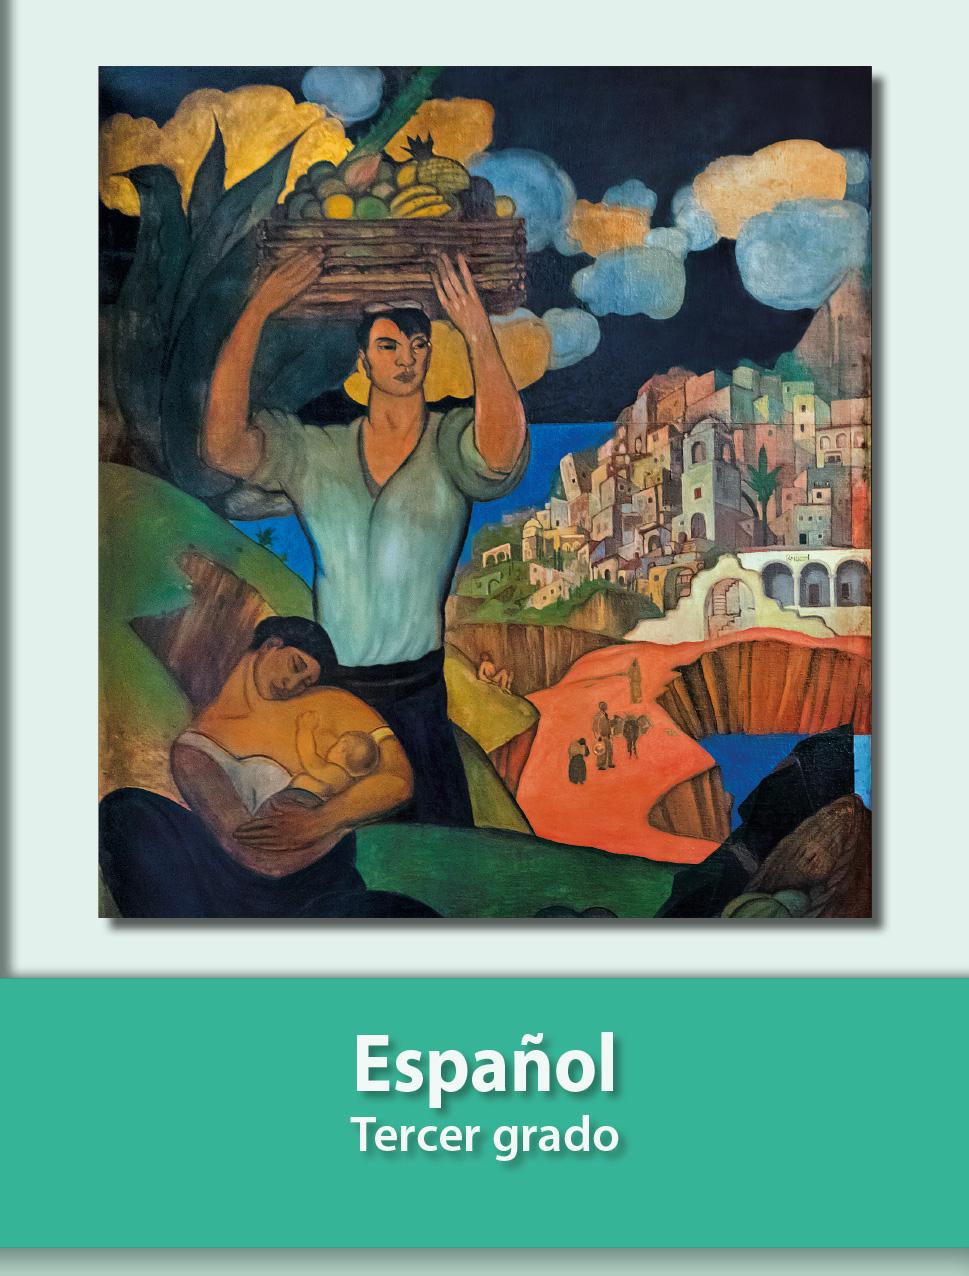 Español Tercer grado 2020-2021 - Libros de Texto Online